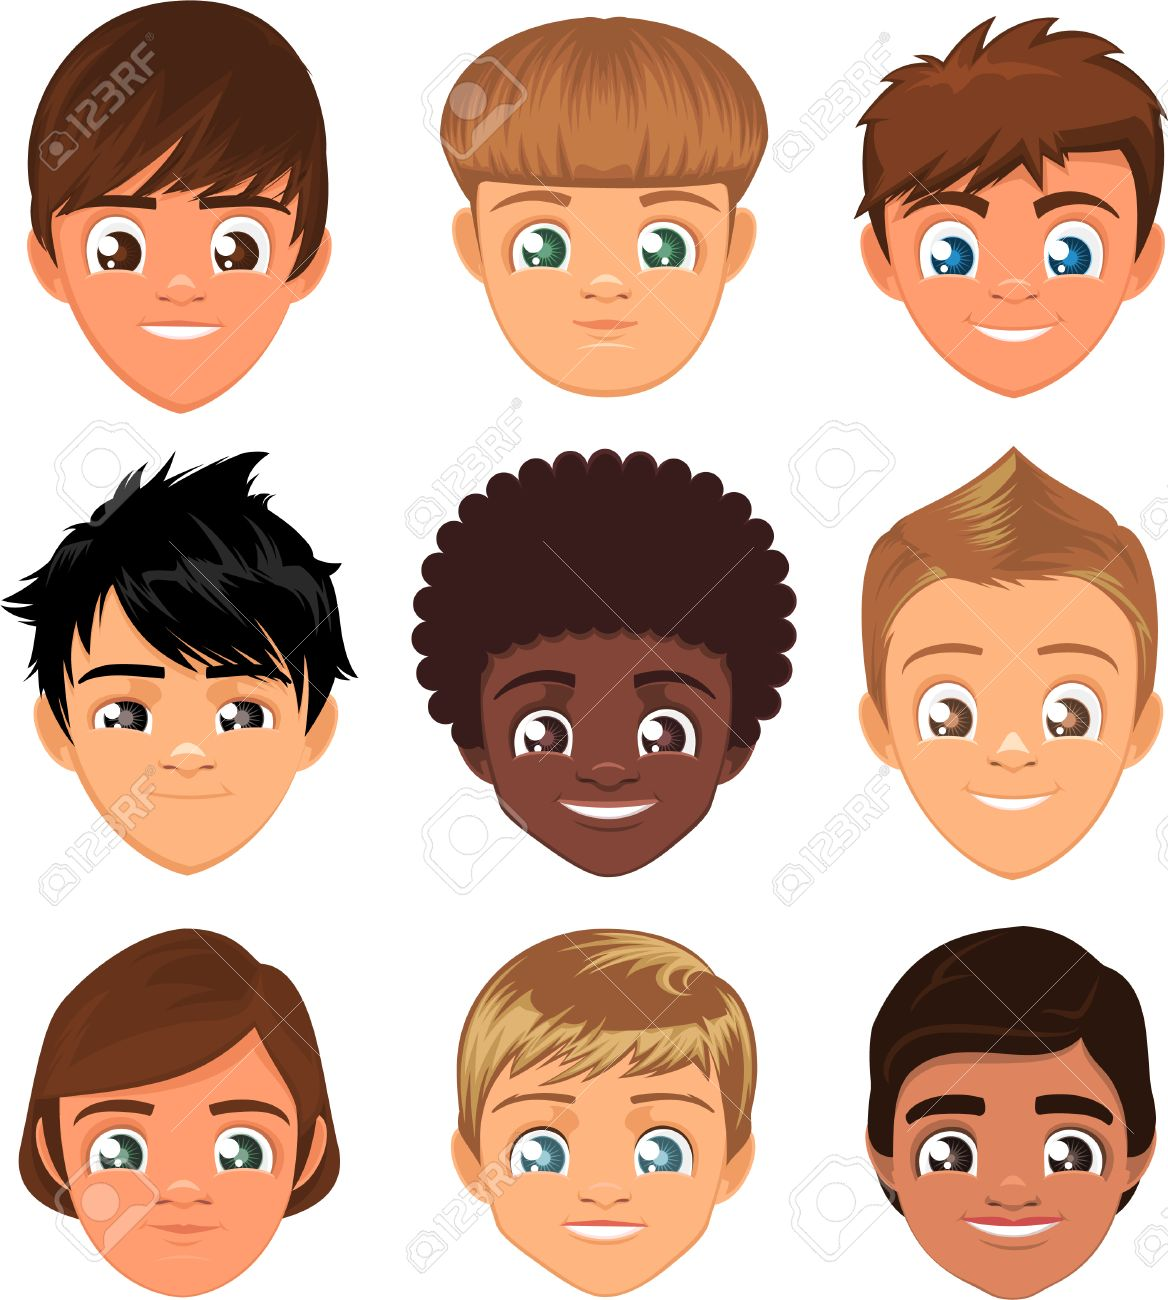 Little Boys Head Faces Avatar Profile Cartoon Special Character